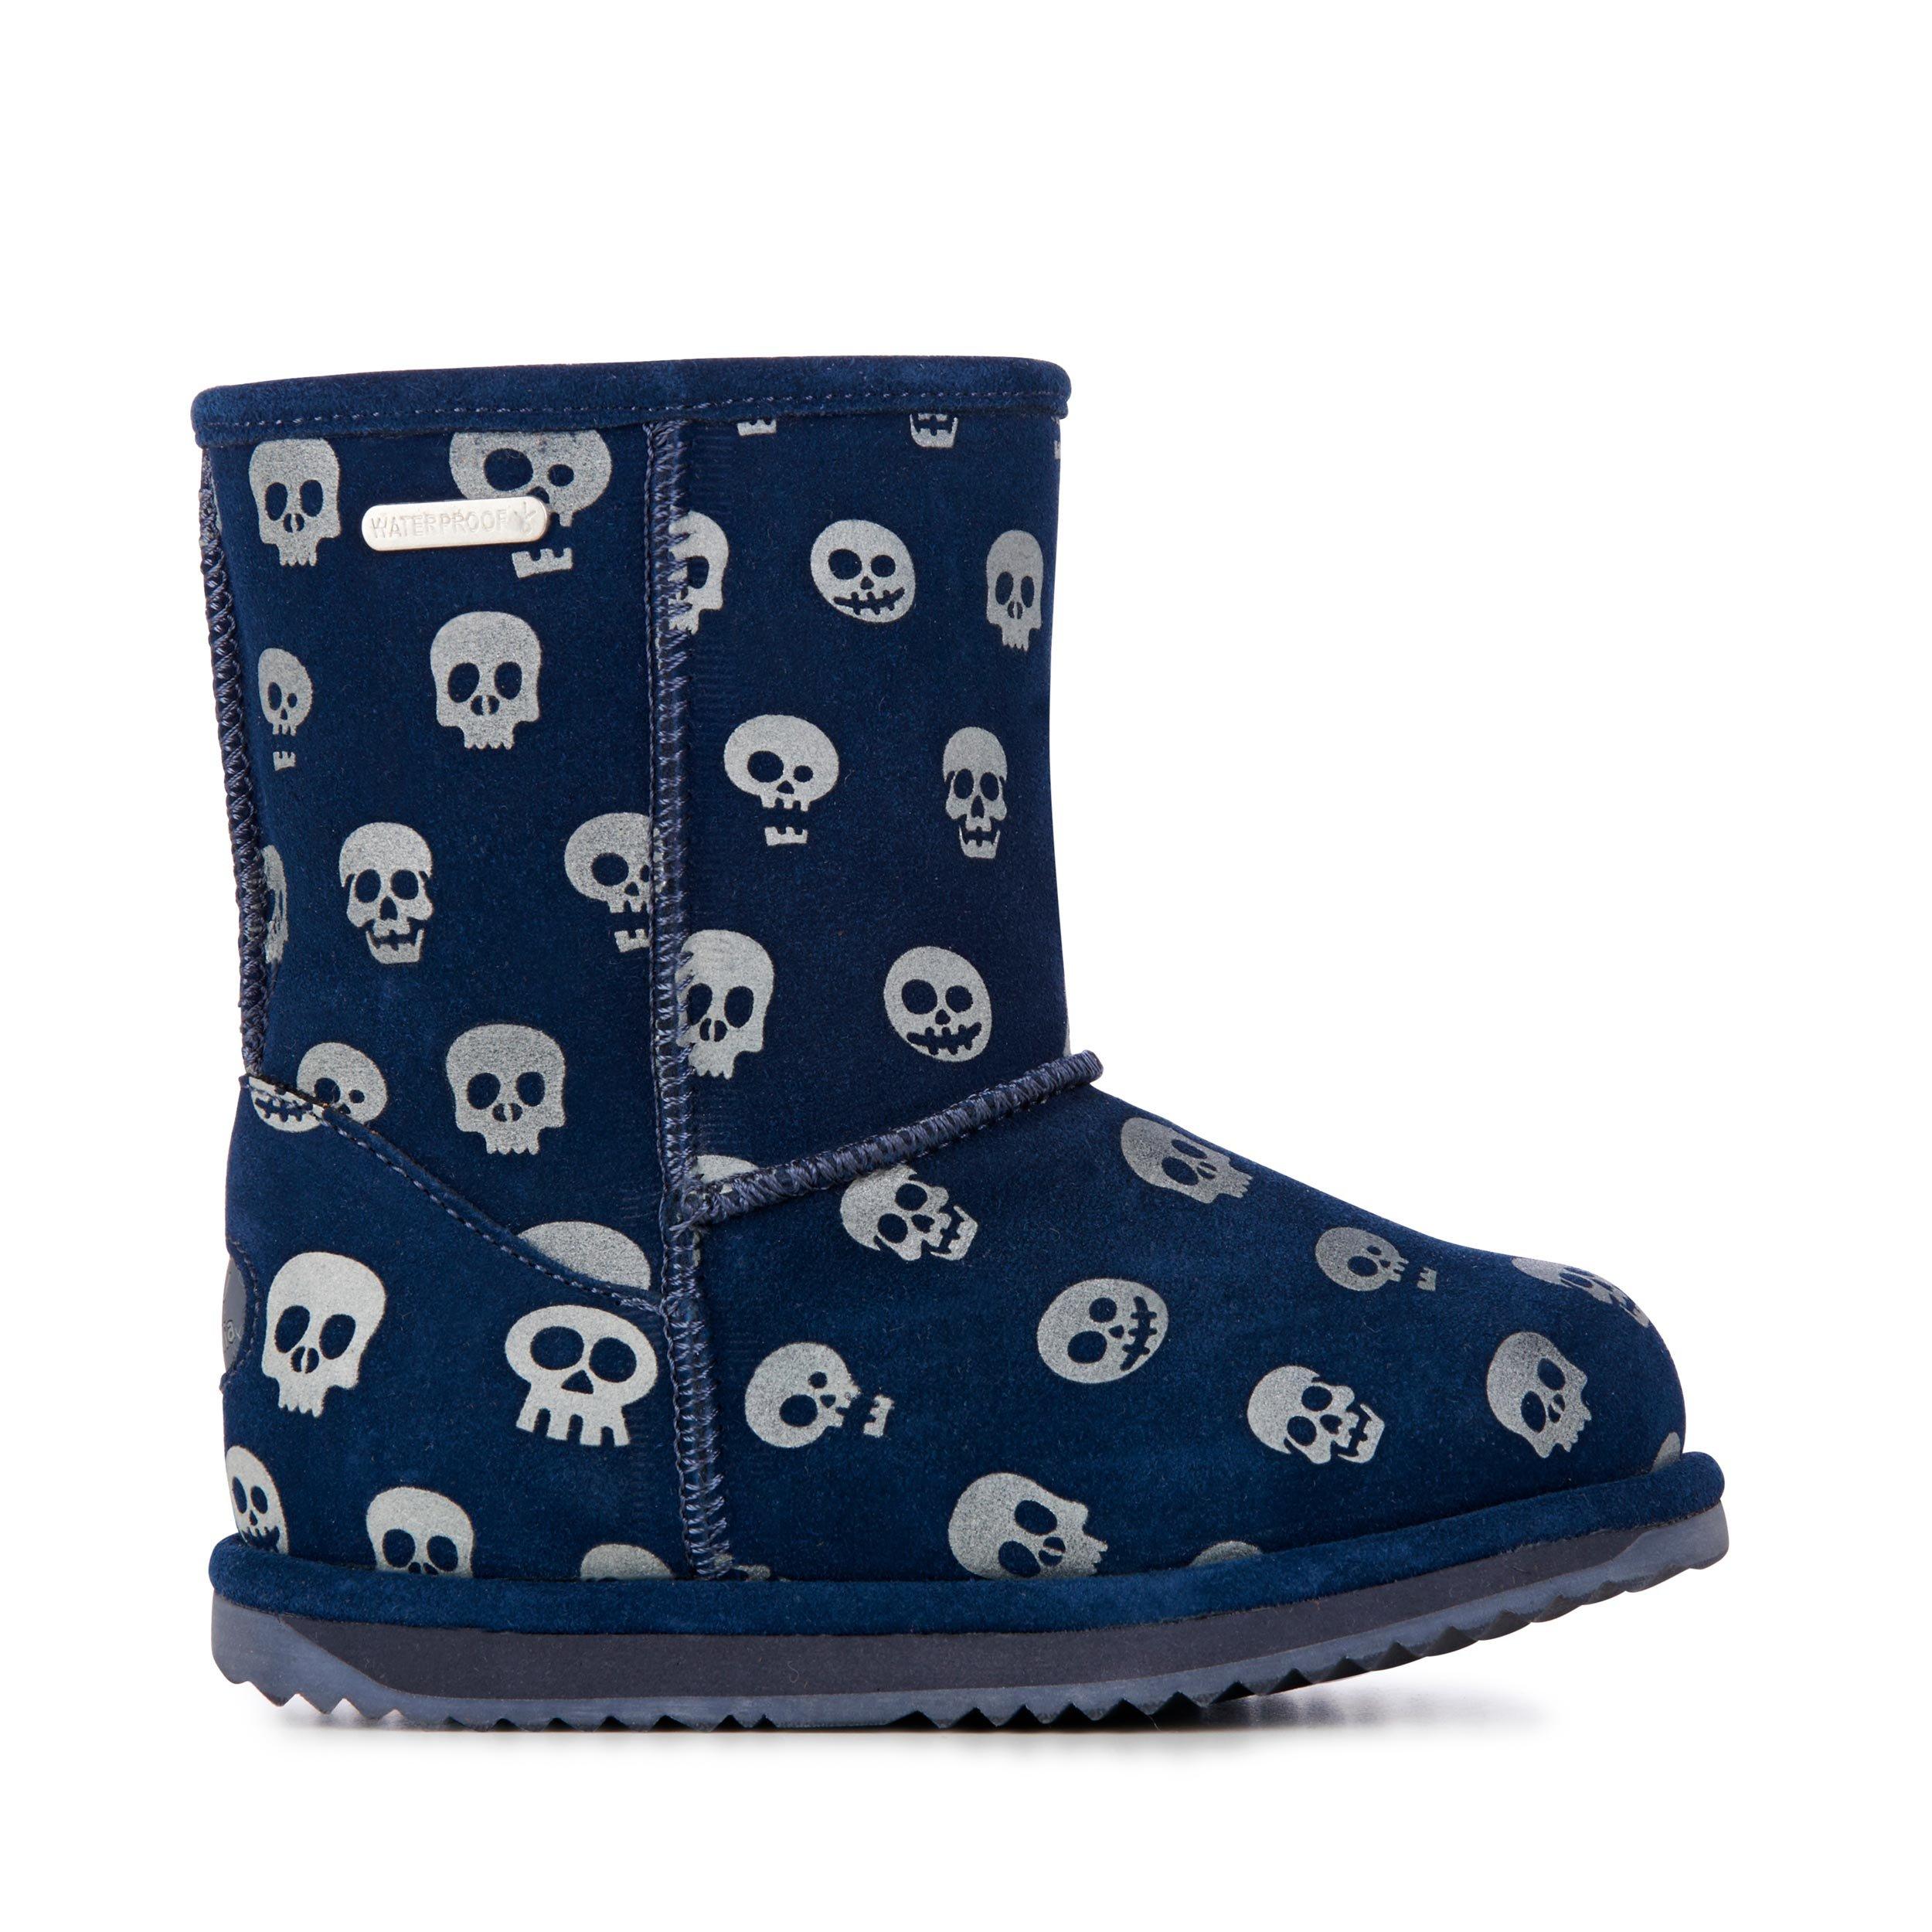 EMU Australia Skull Brumby Kids Wool Waterproof Boots Size 12